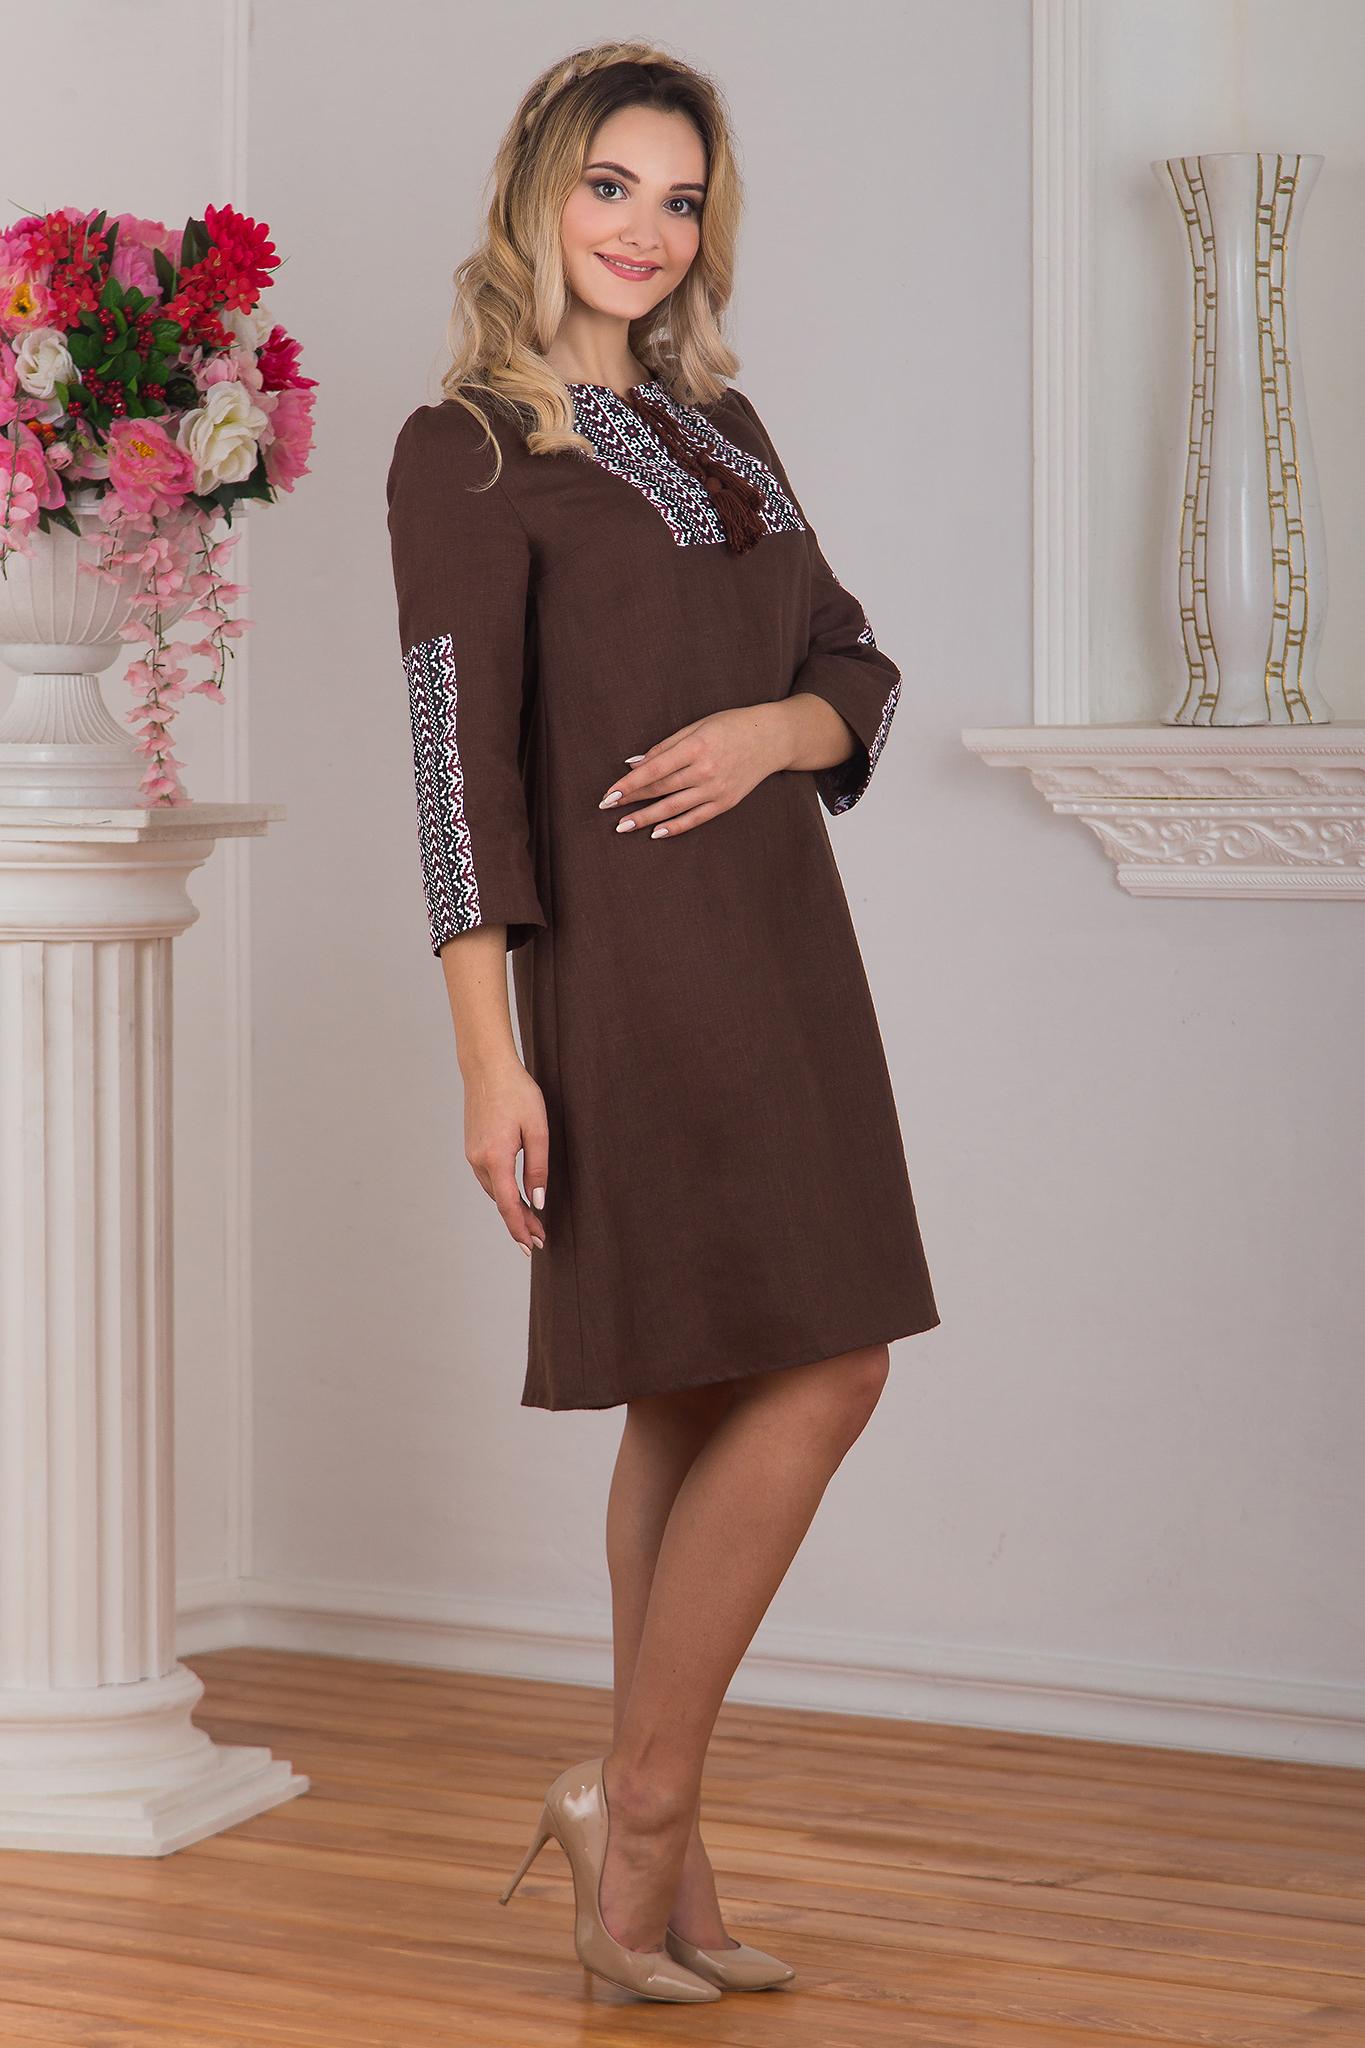 Корица, платья в стиле бохо от интернет- магазина Иванка